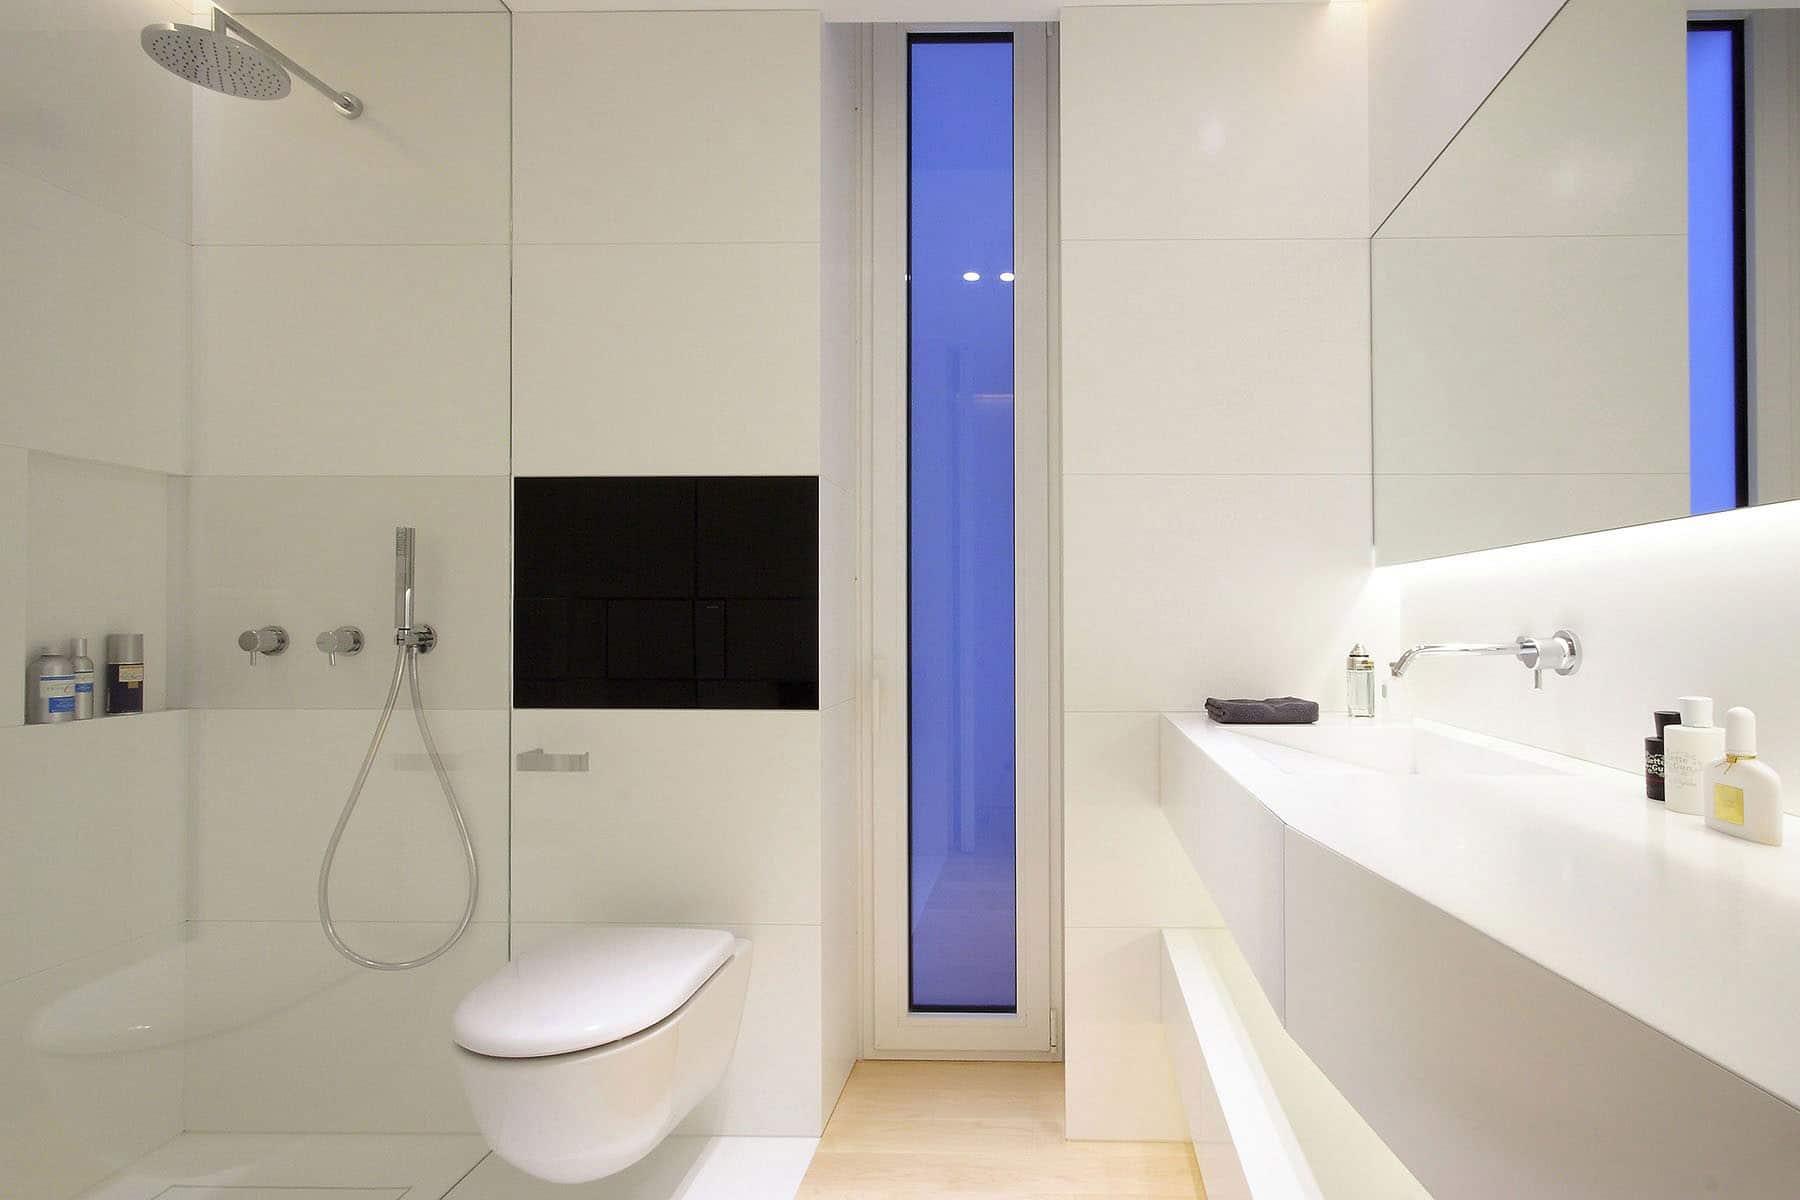 plano departamento peque o dos dormitorios On banos modernos para departamentos